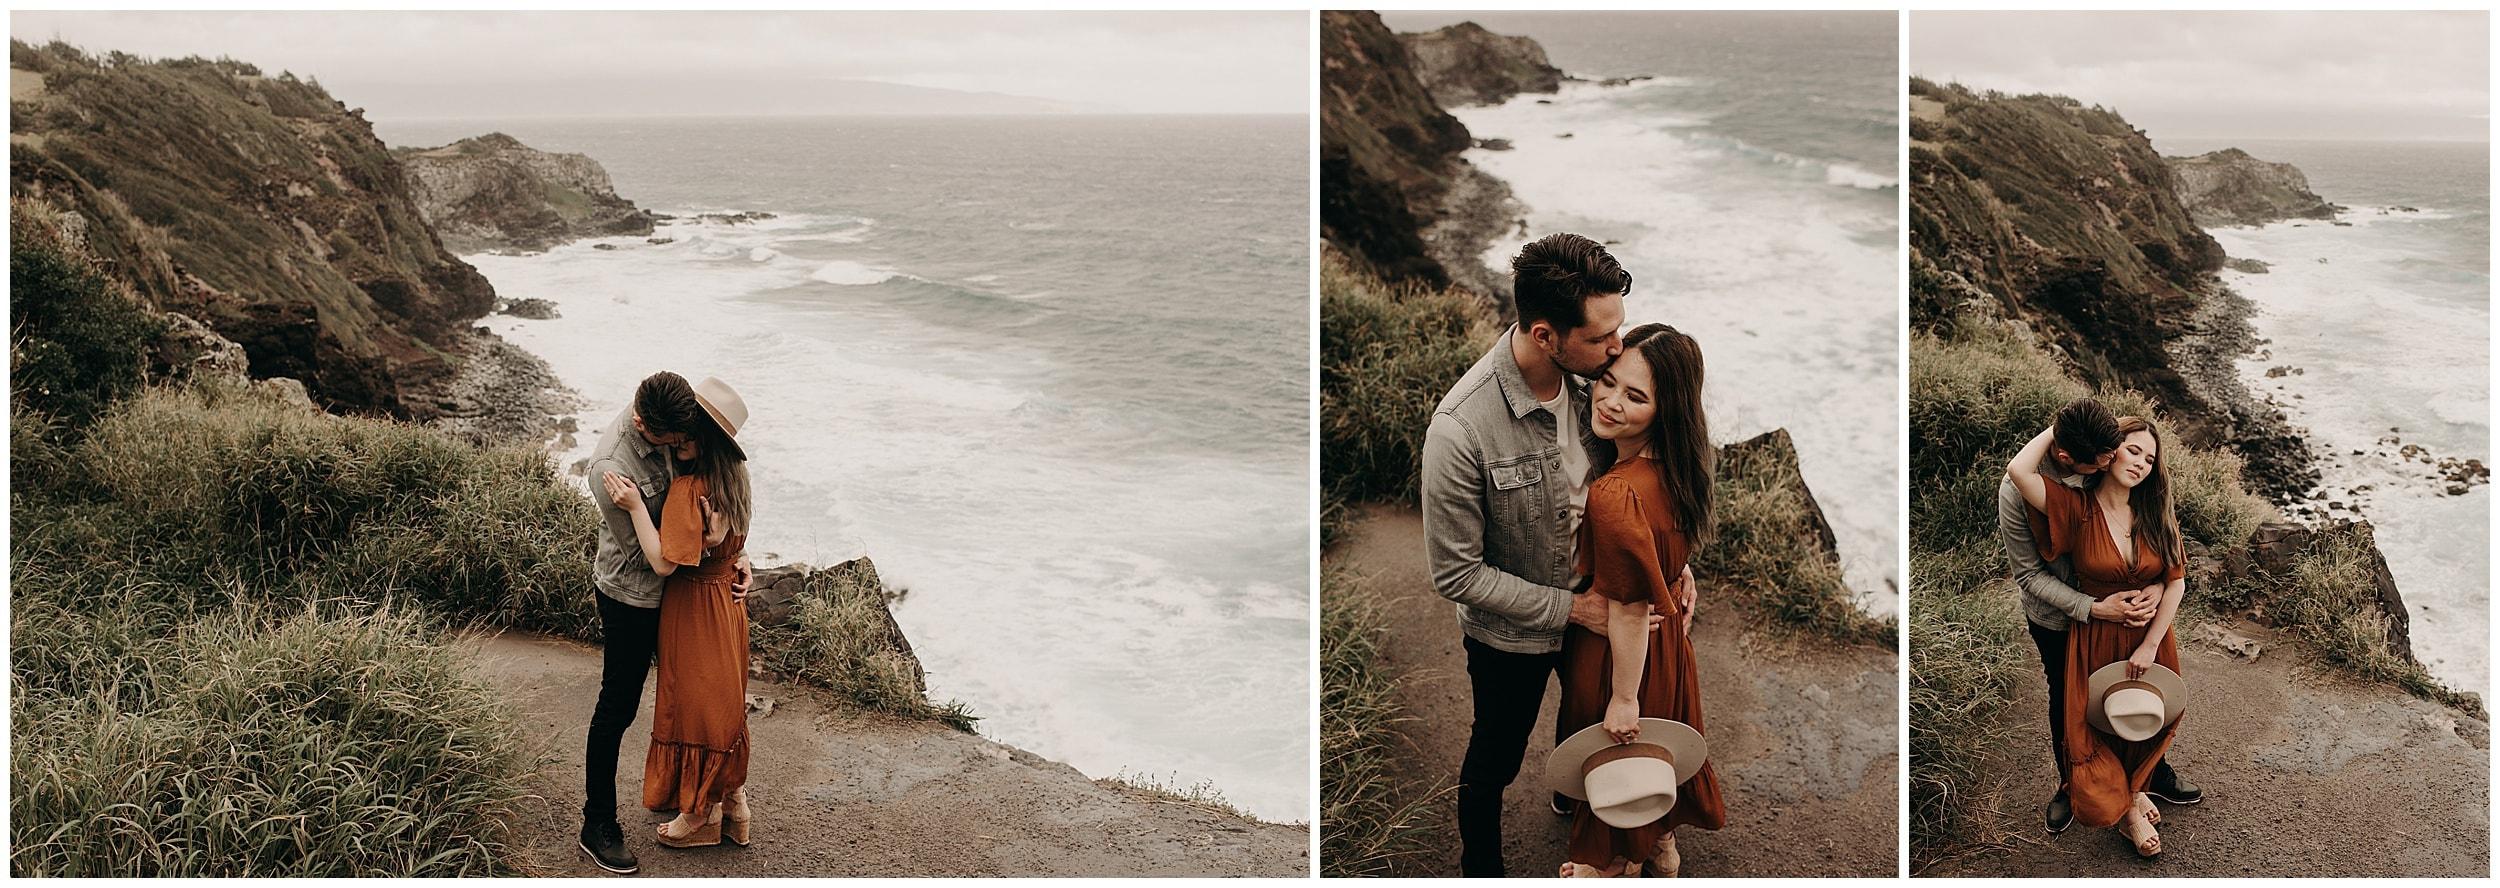 Maui couples photographer_0021